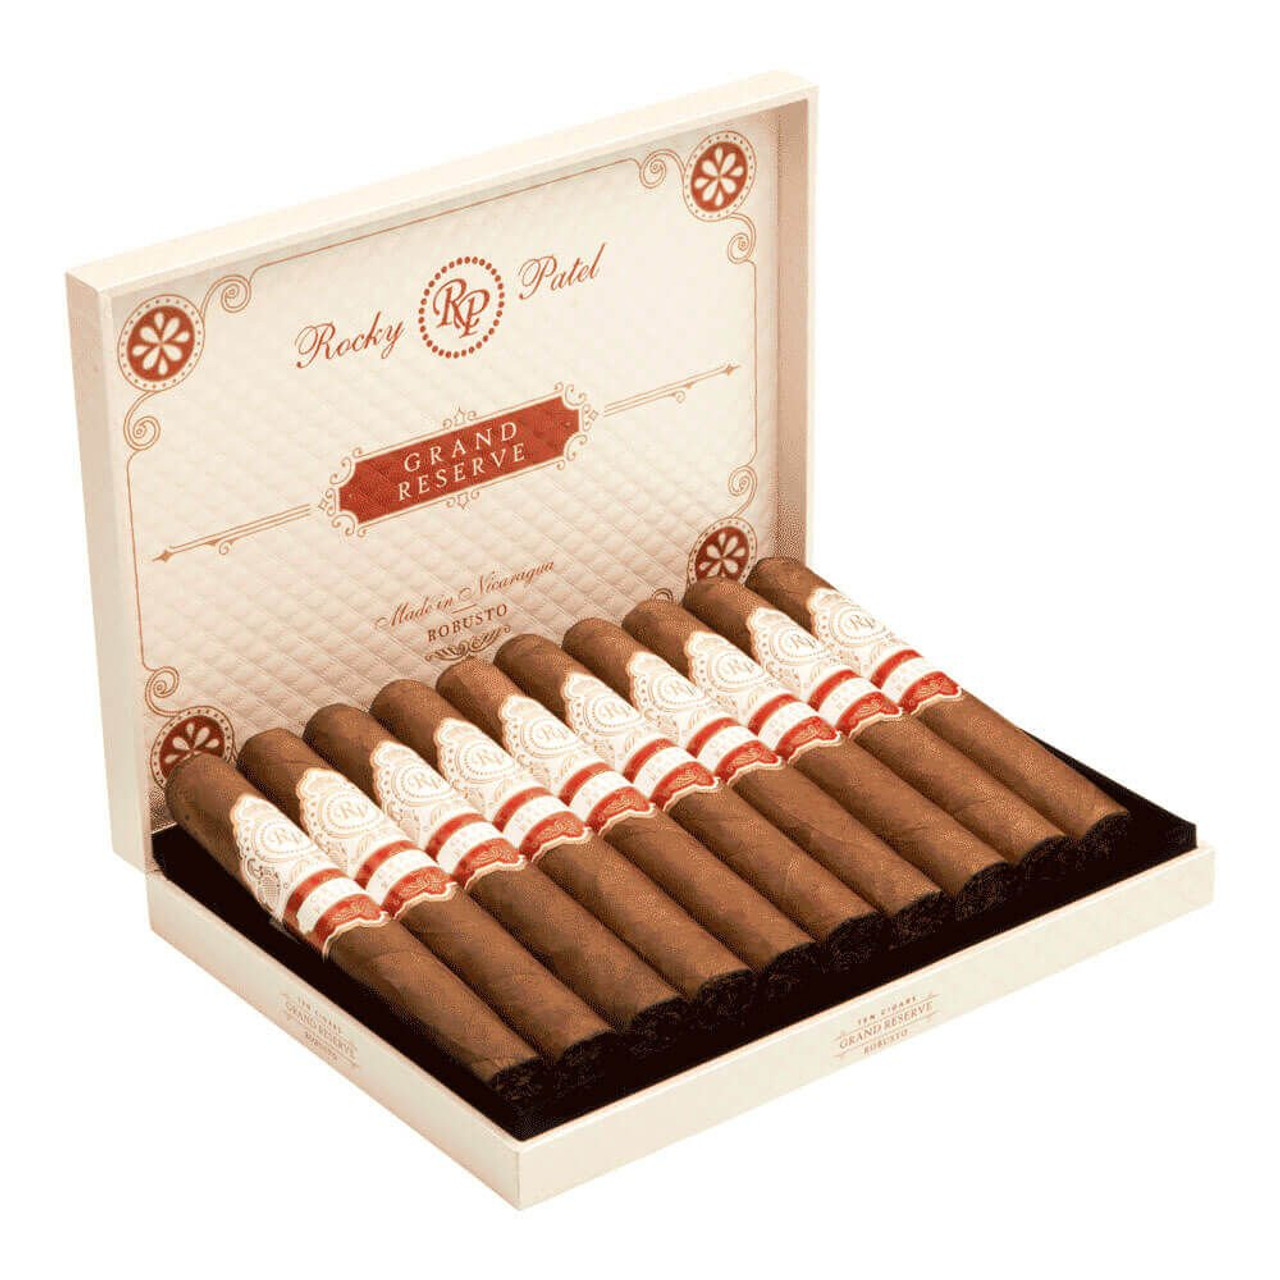 Rocky Patel Grand Reserve Toro Cigars - 6.0 x 52 (Box of 10)